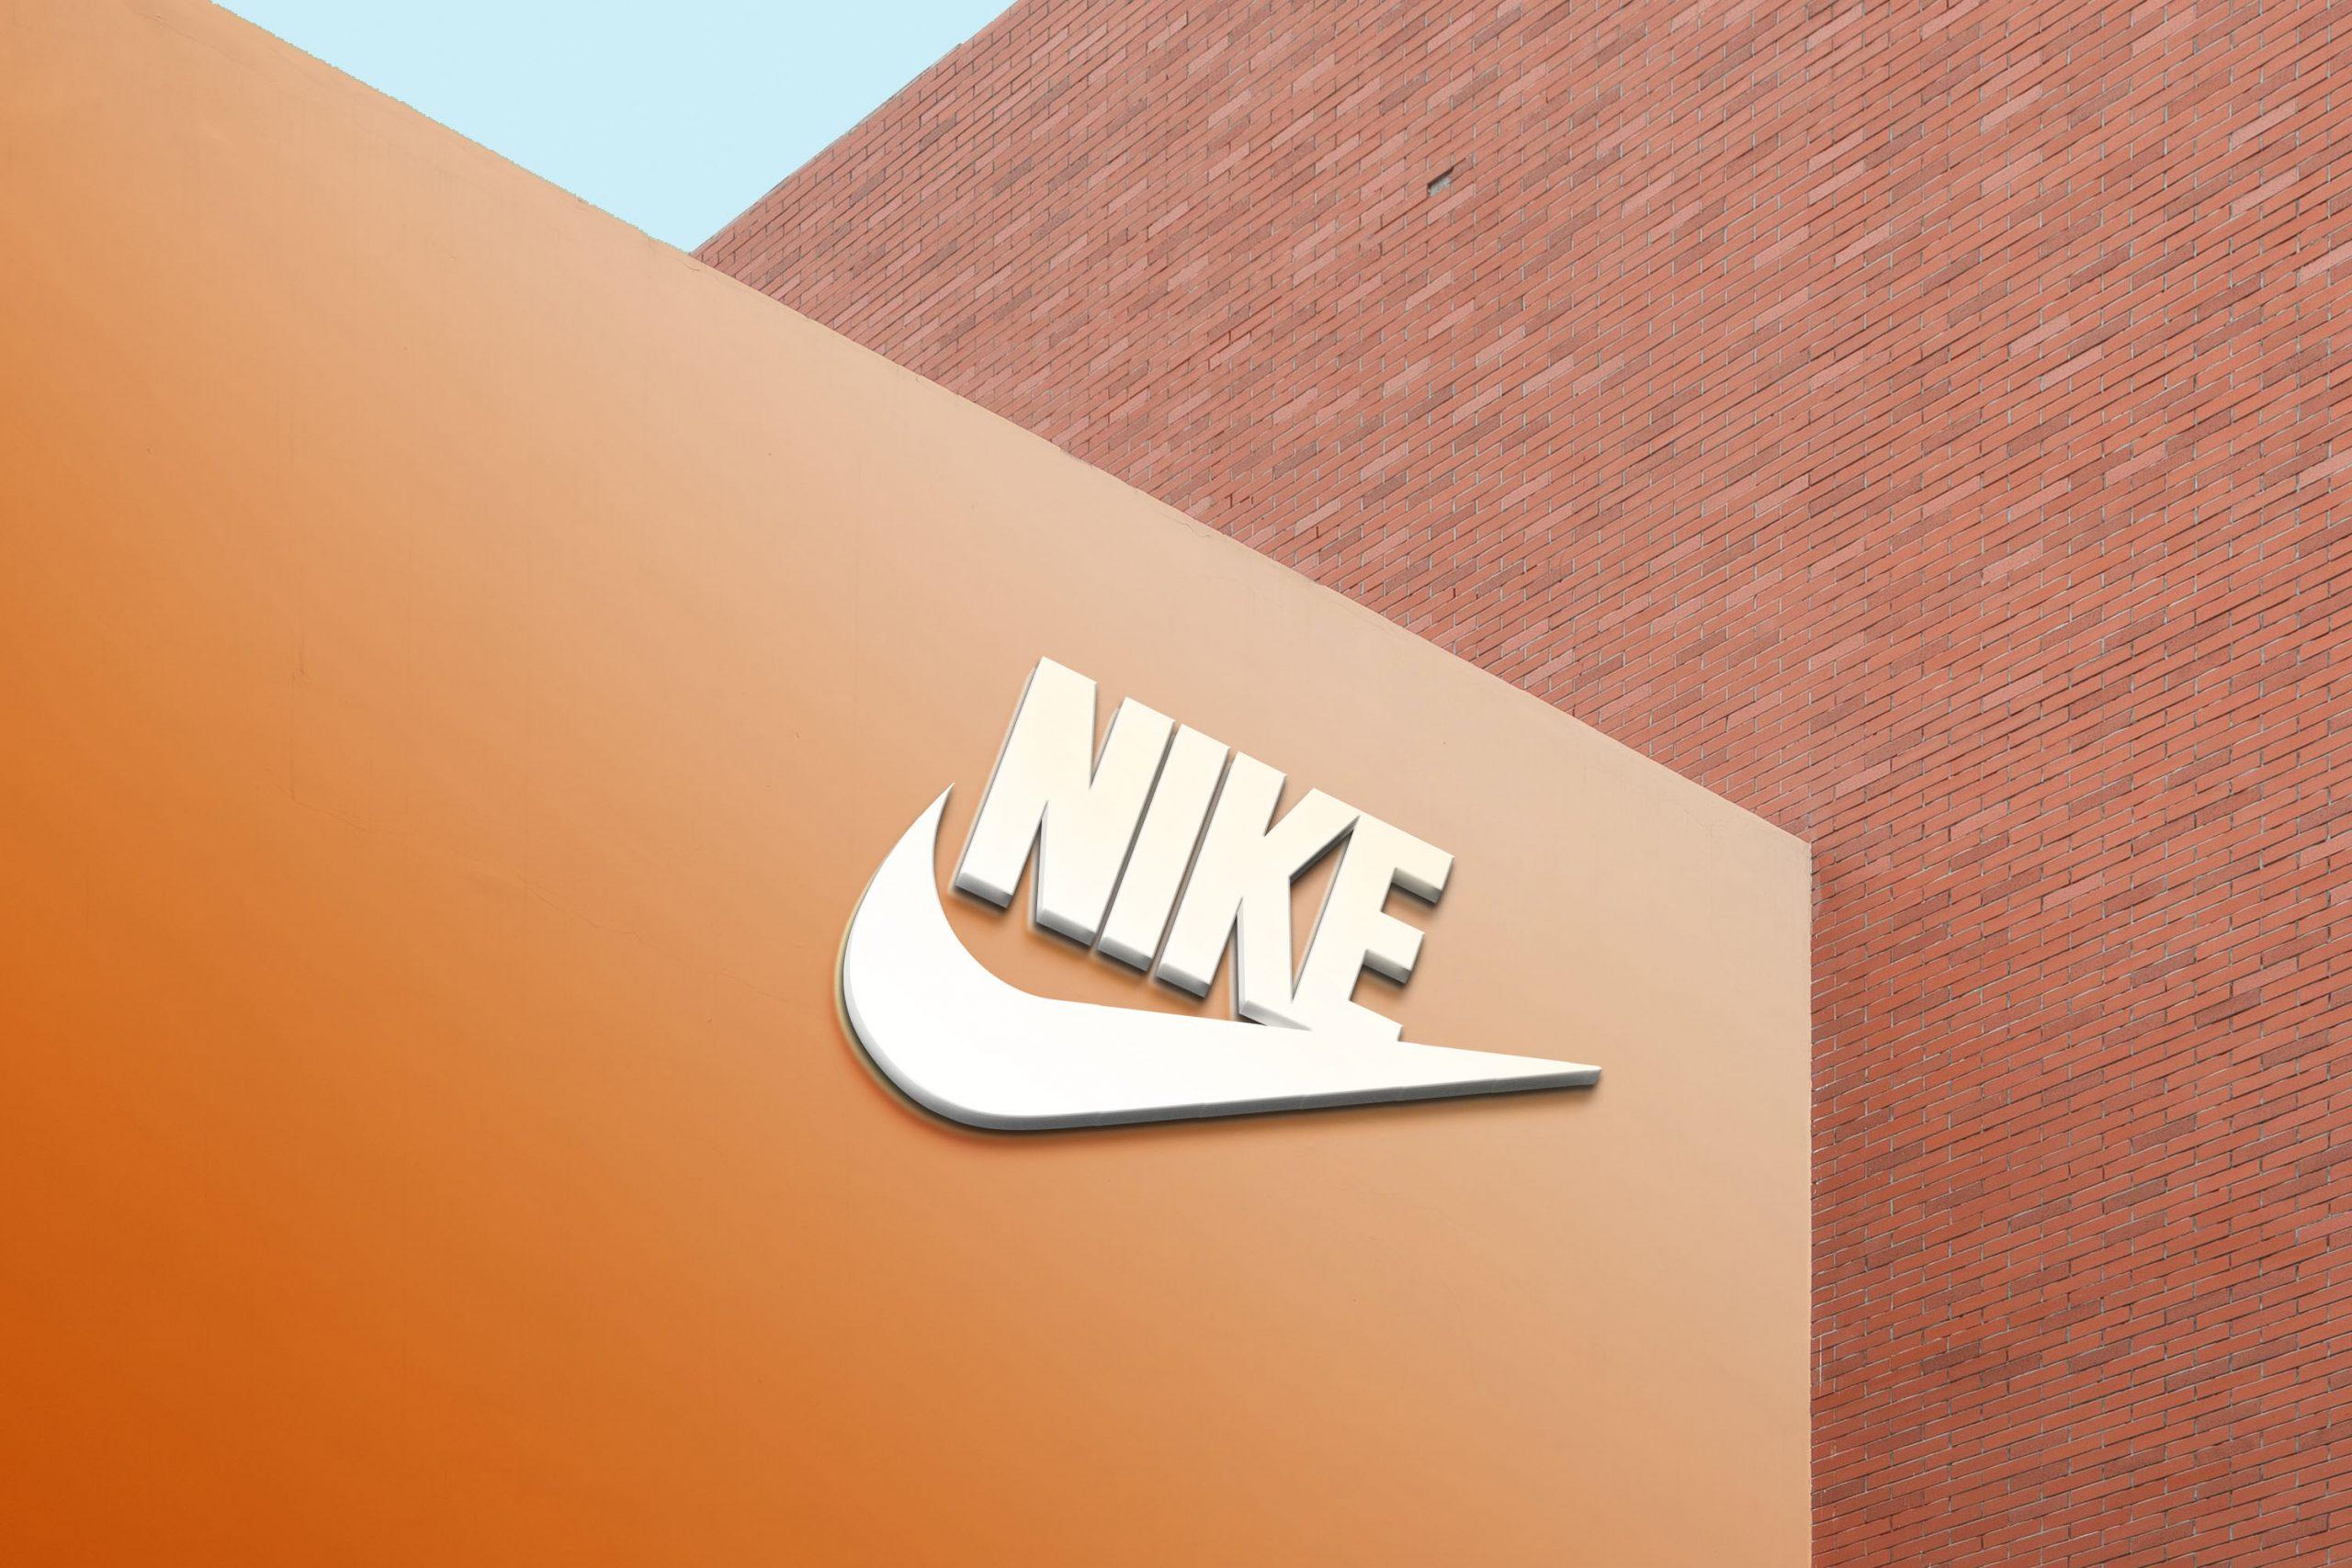 Free 3D Modern Wall with Bricks Logo Mockup